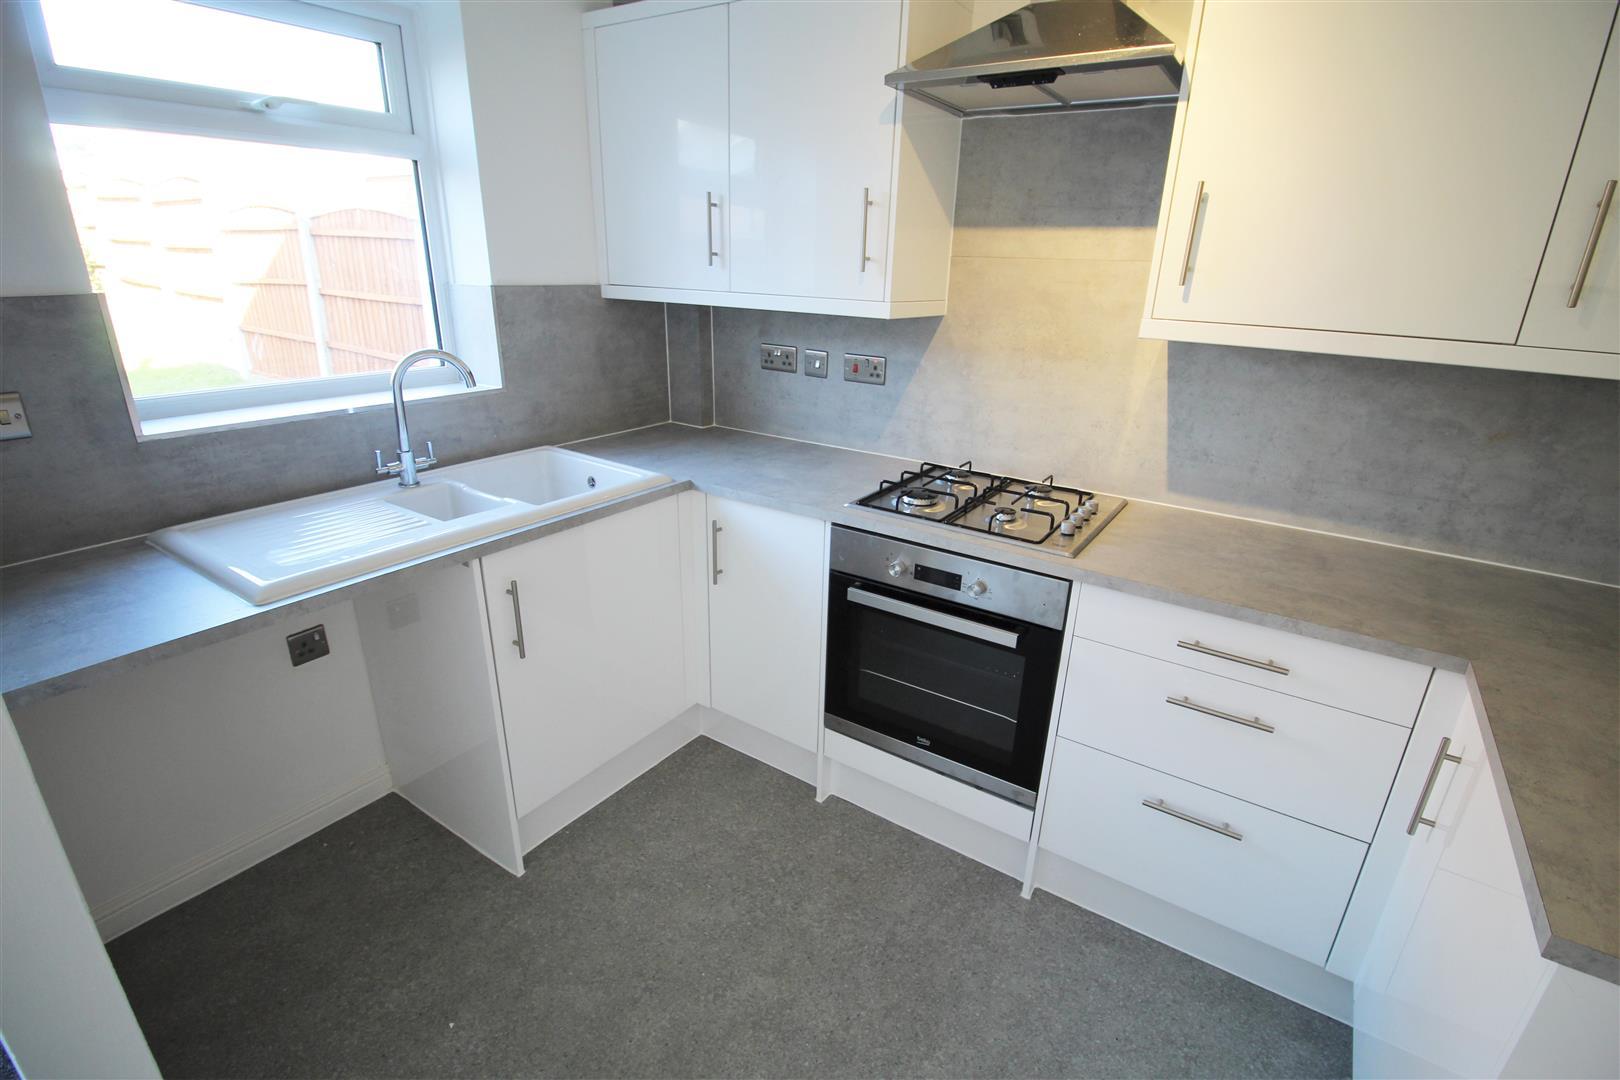 2 Bedrooms, House - Semi-Detached, Longdown Road, Liverpool